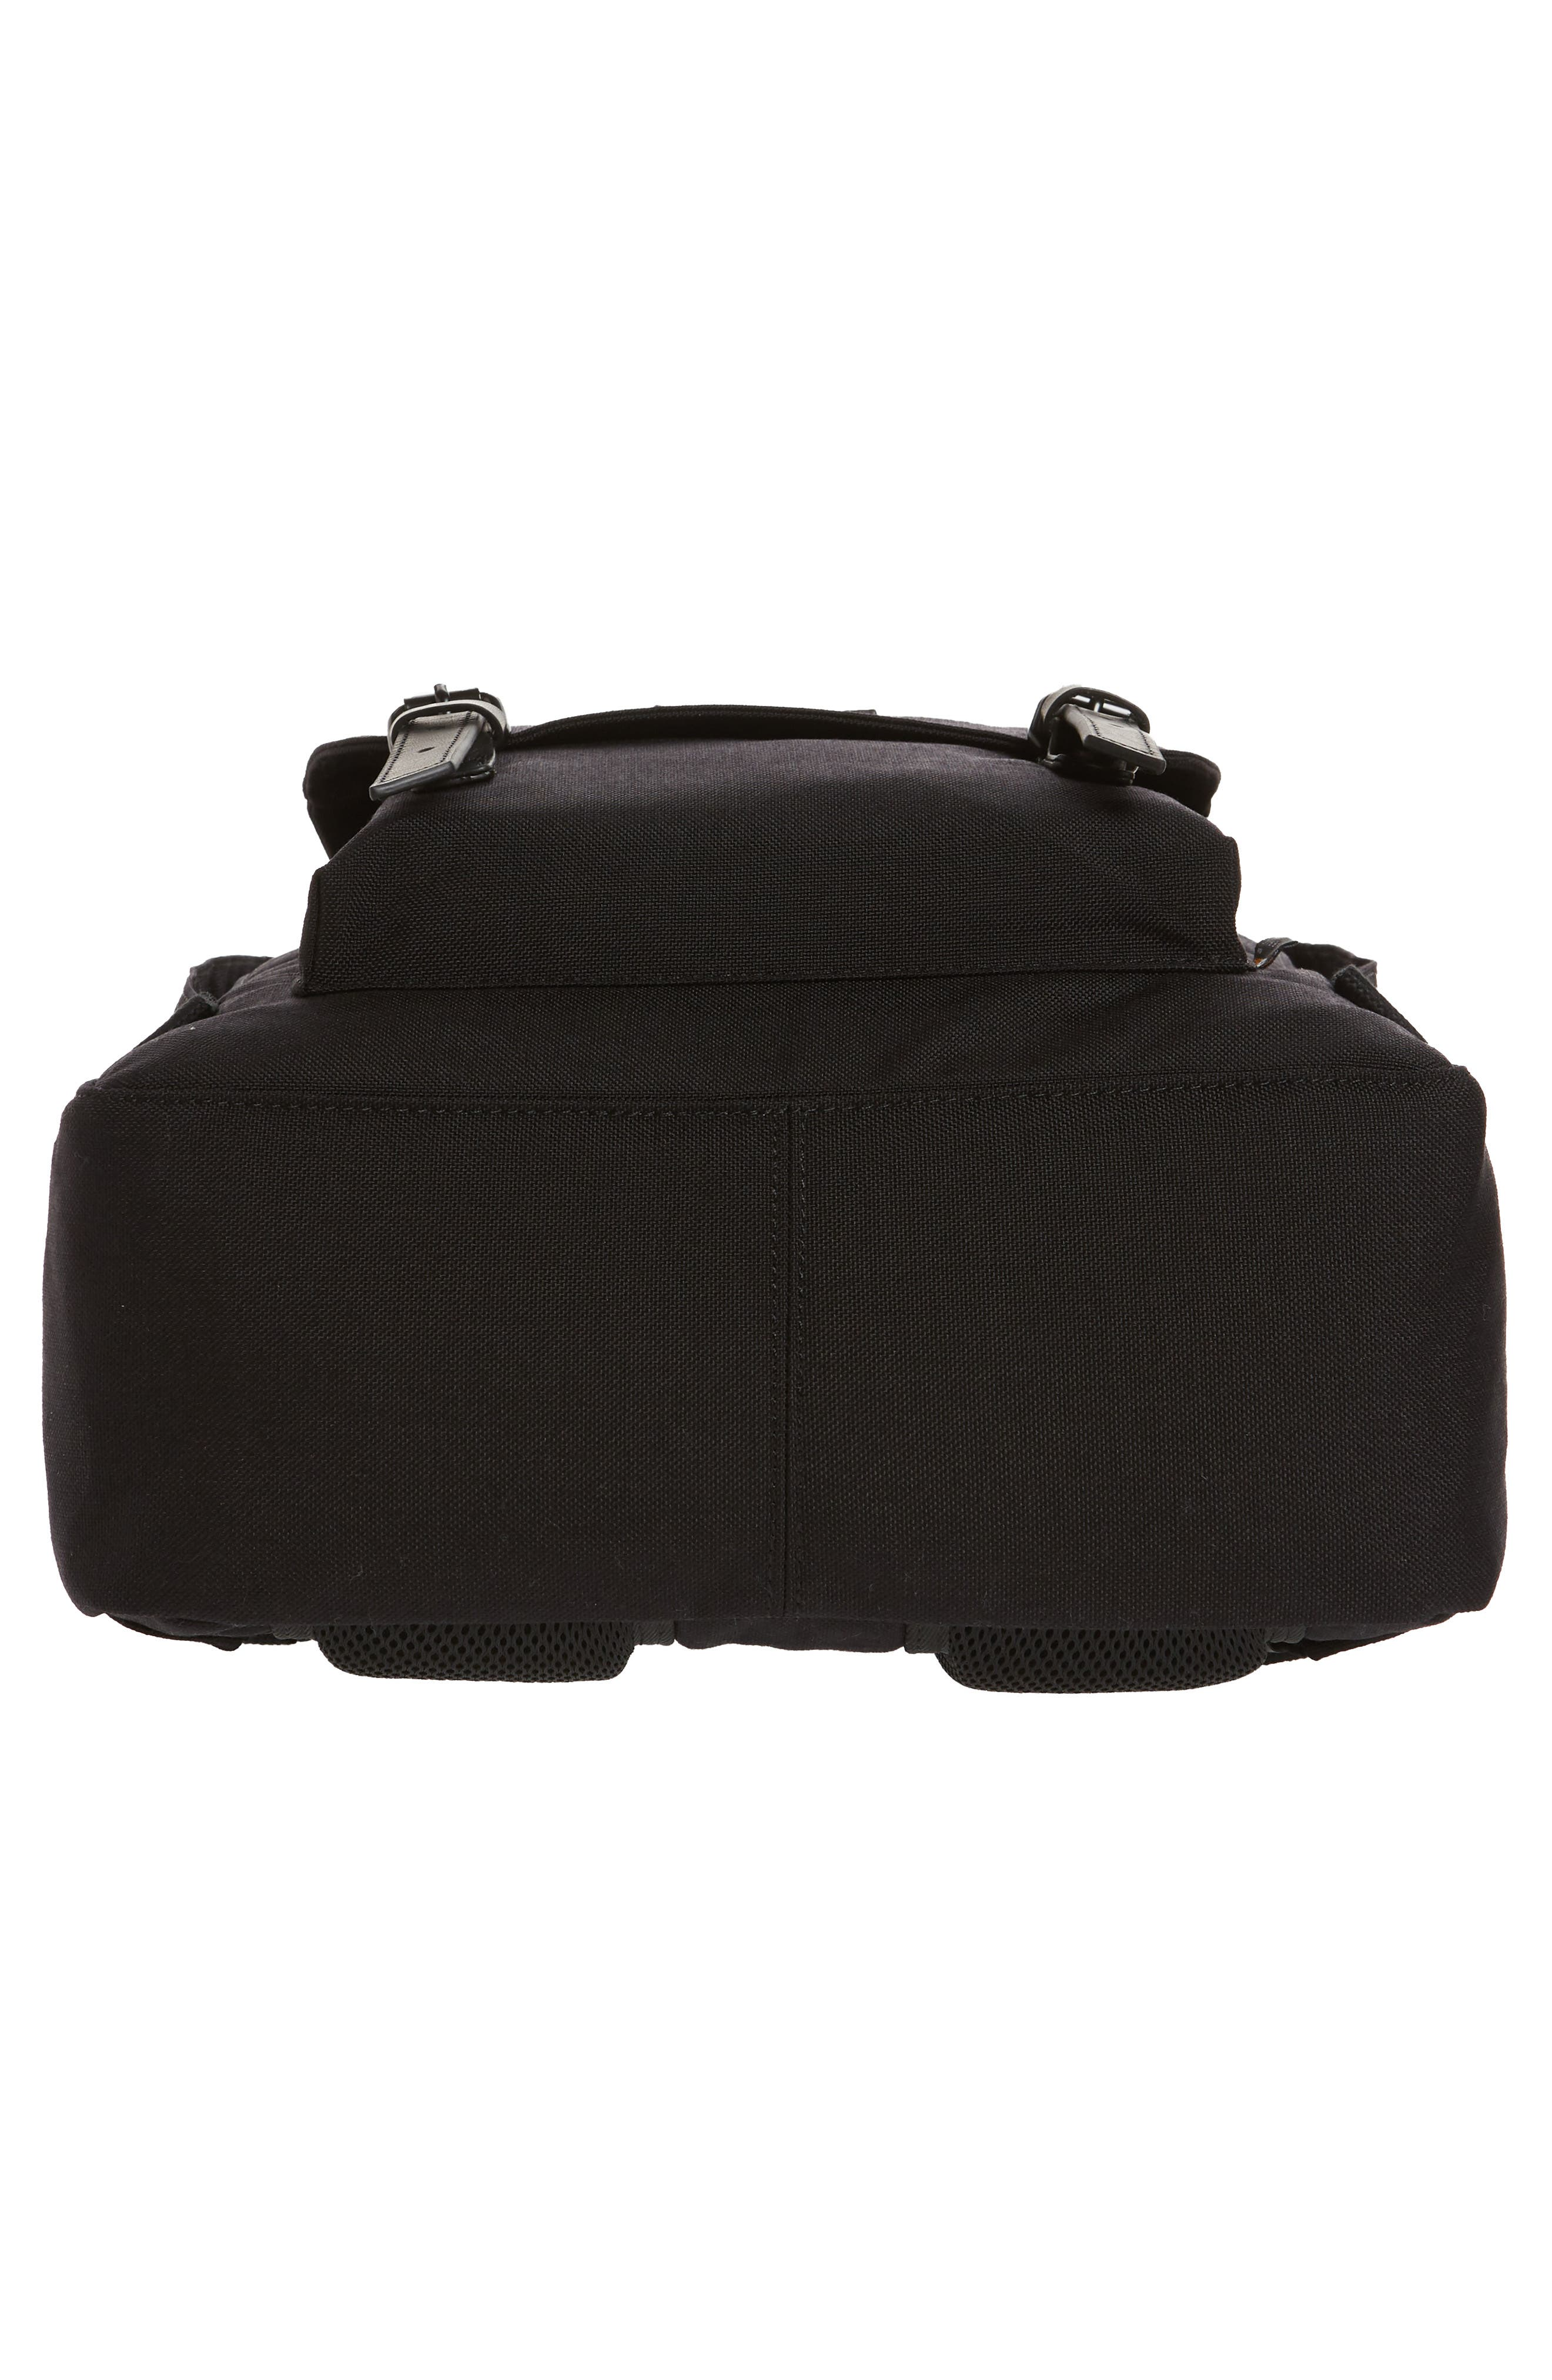 Macaroon Large Cordura<sup>®</sup> Black Series Water Repellent Backpack,                             Alternate thumbnail 6, color,                             Black